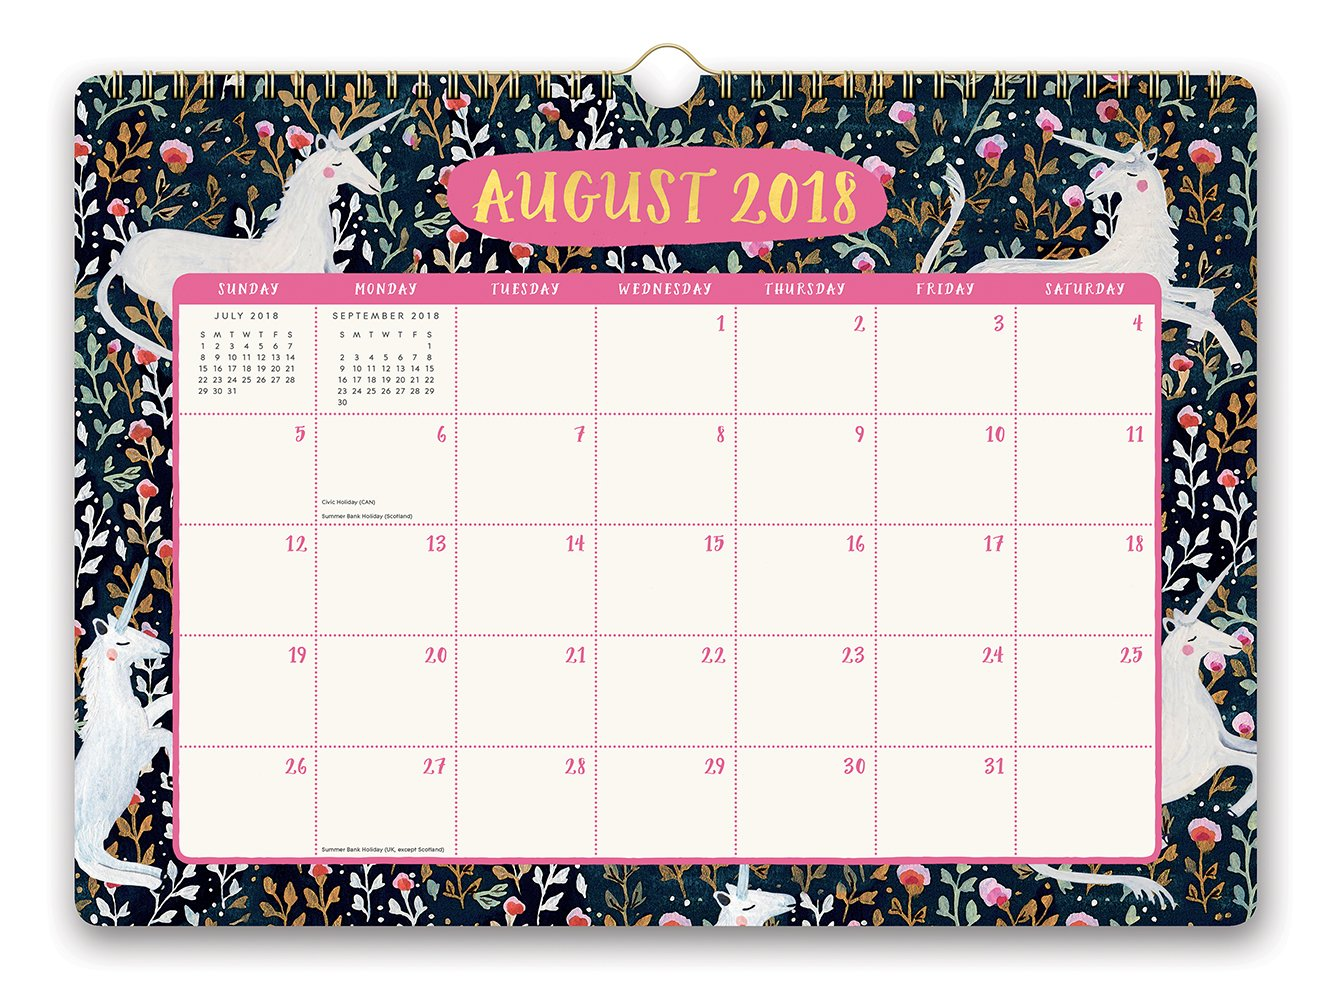 Orange Circle Studio 2019 Deluxe Wall Calendar, August 2018 - December 2019, Stay Magical Unicorns